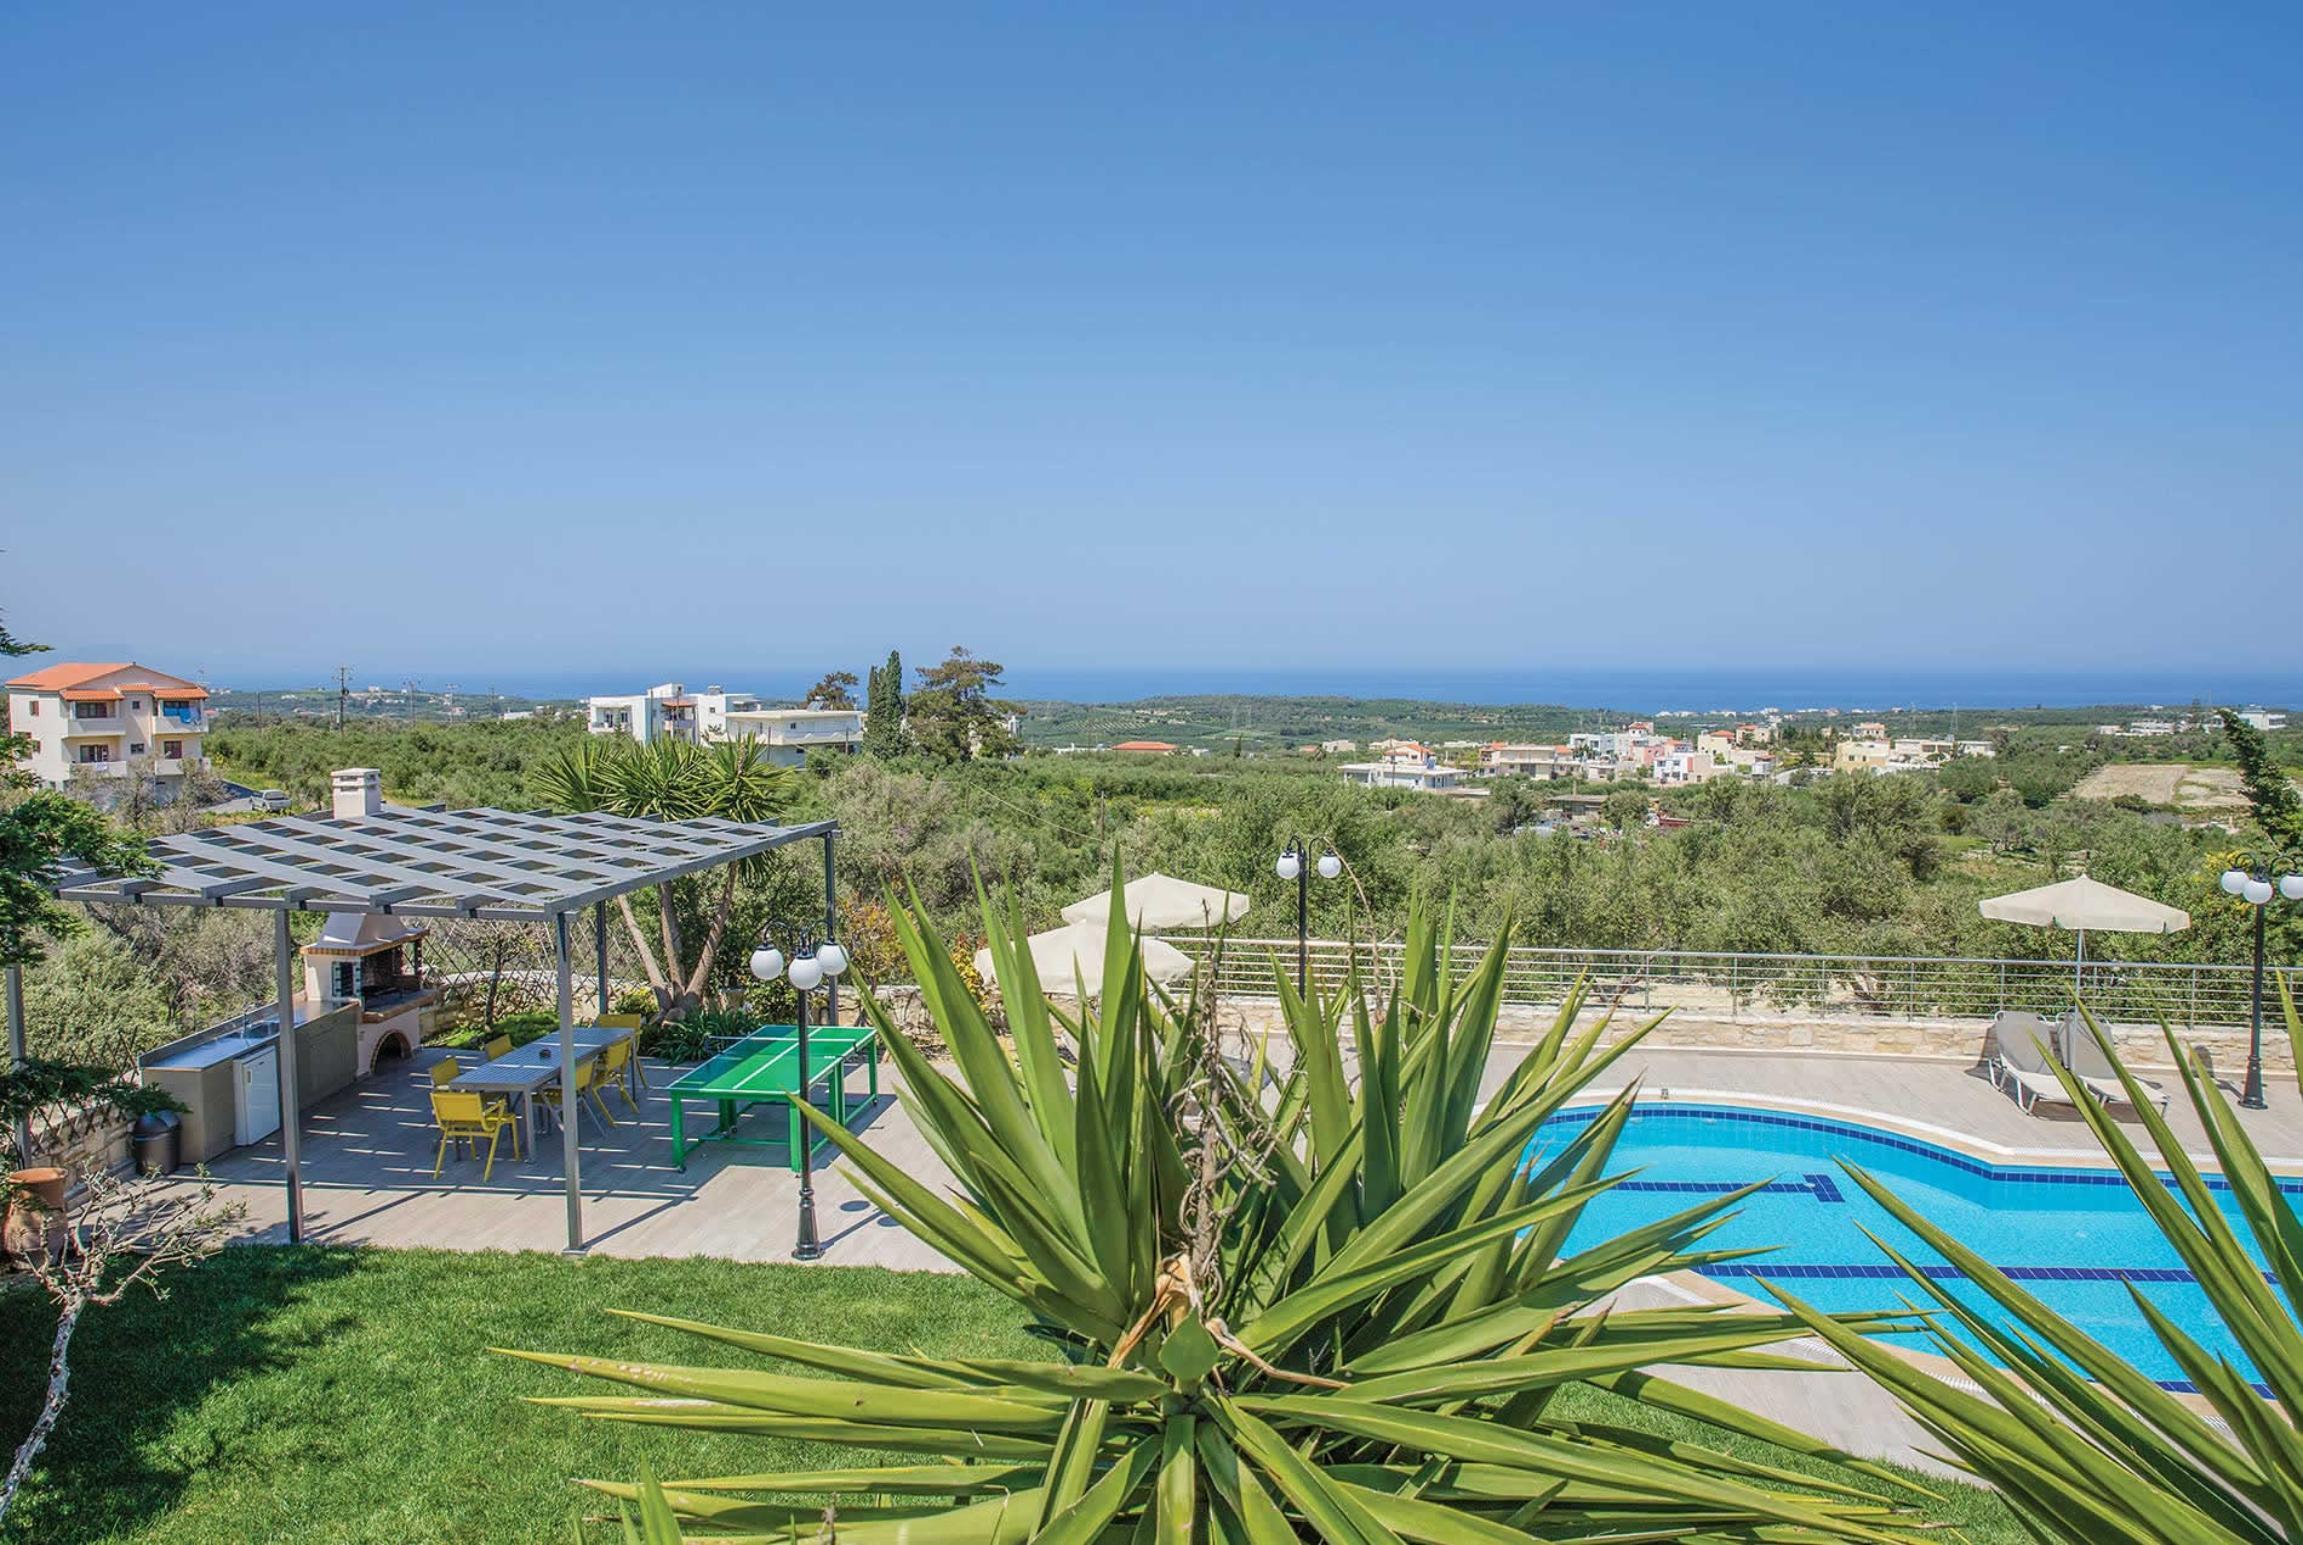 Ferienhaus Kyveli (2654321), Rethymno, Kreta Nordküste, Kreta, Griechenland, Bild 6